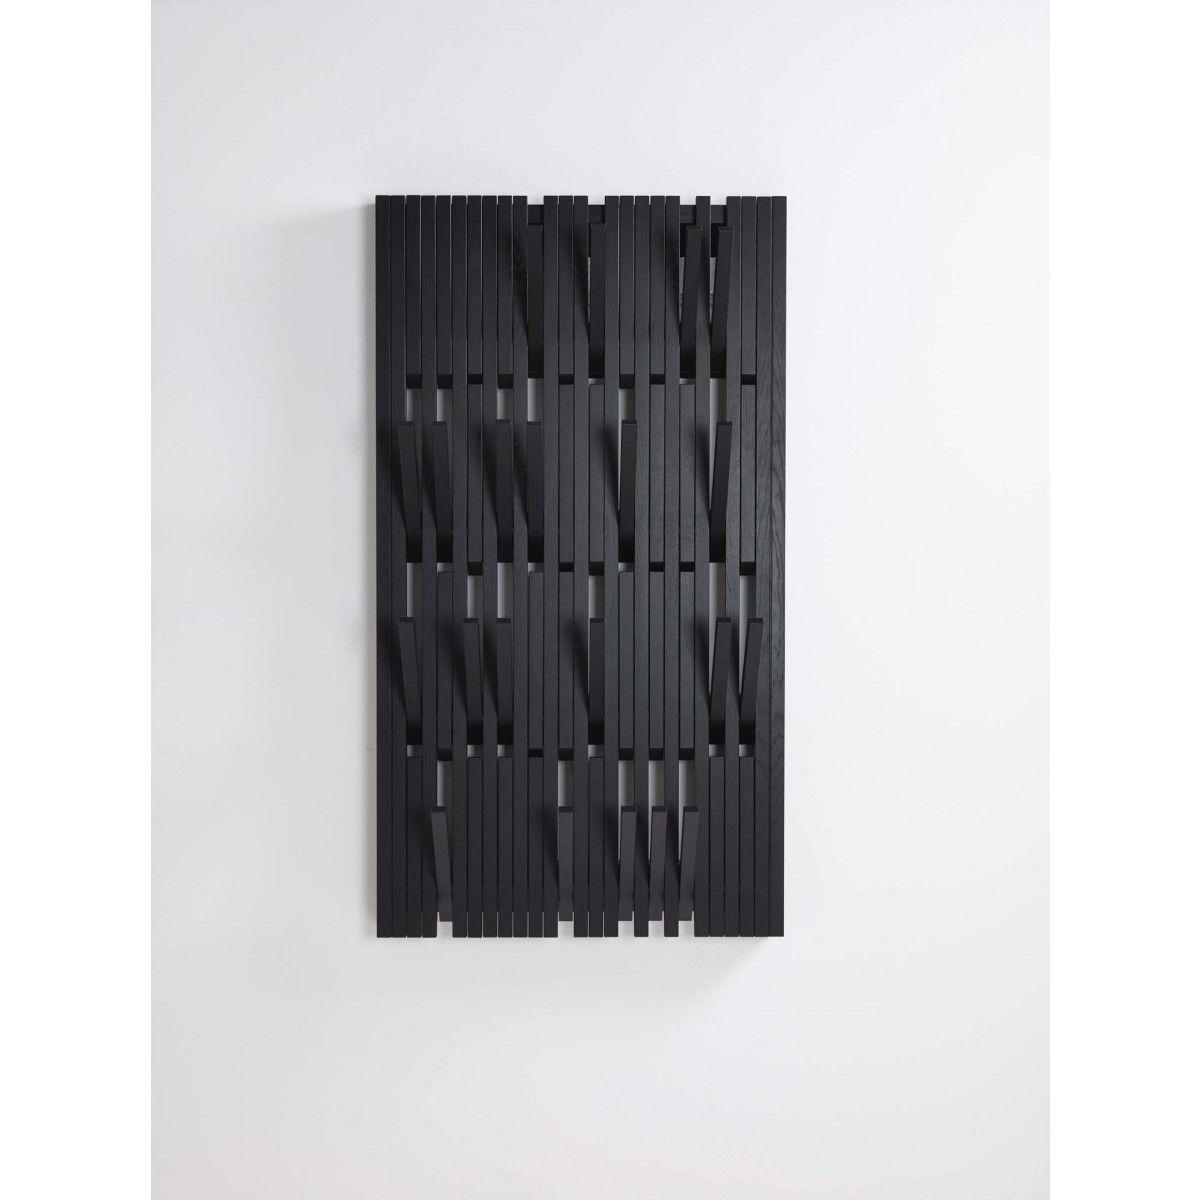 Einrichten Design De piano hanger per use einrichten design de ocd you me